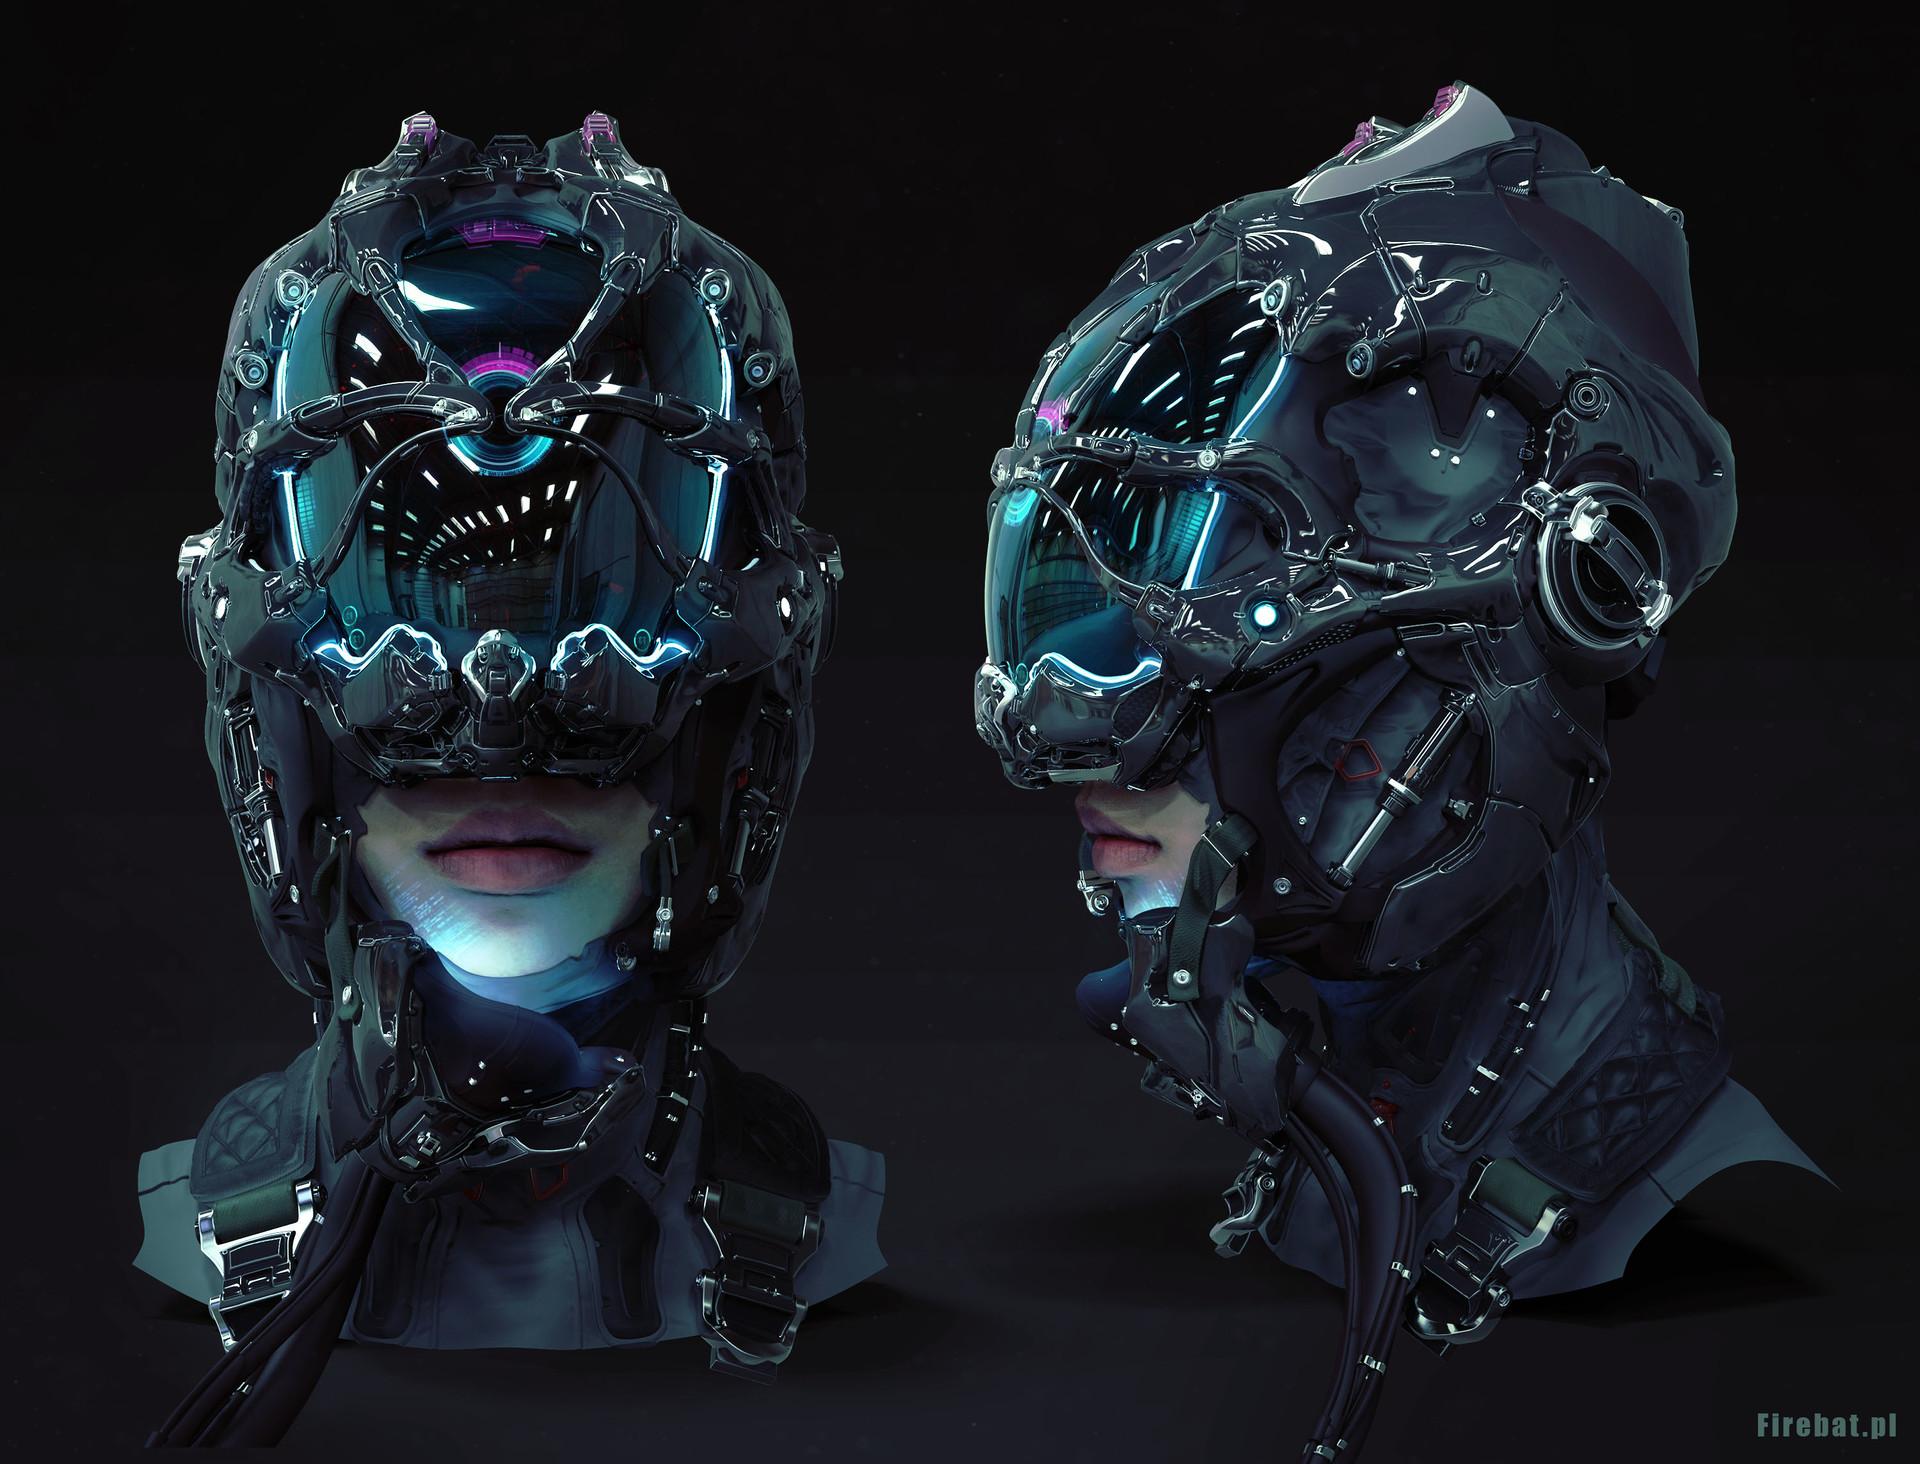 The Stunning 3d Art of Andrzej Marszalek